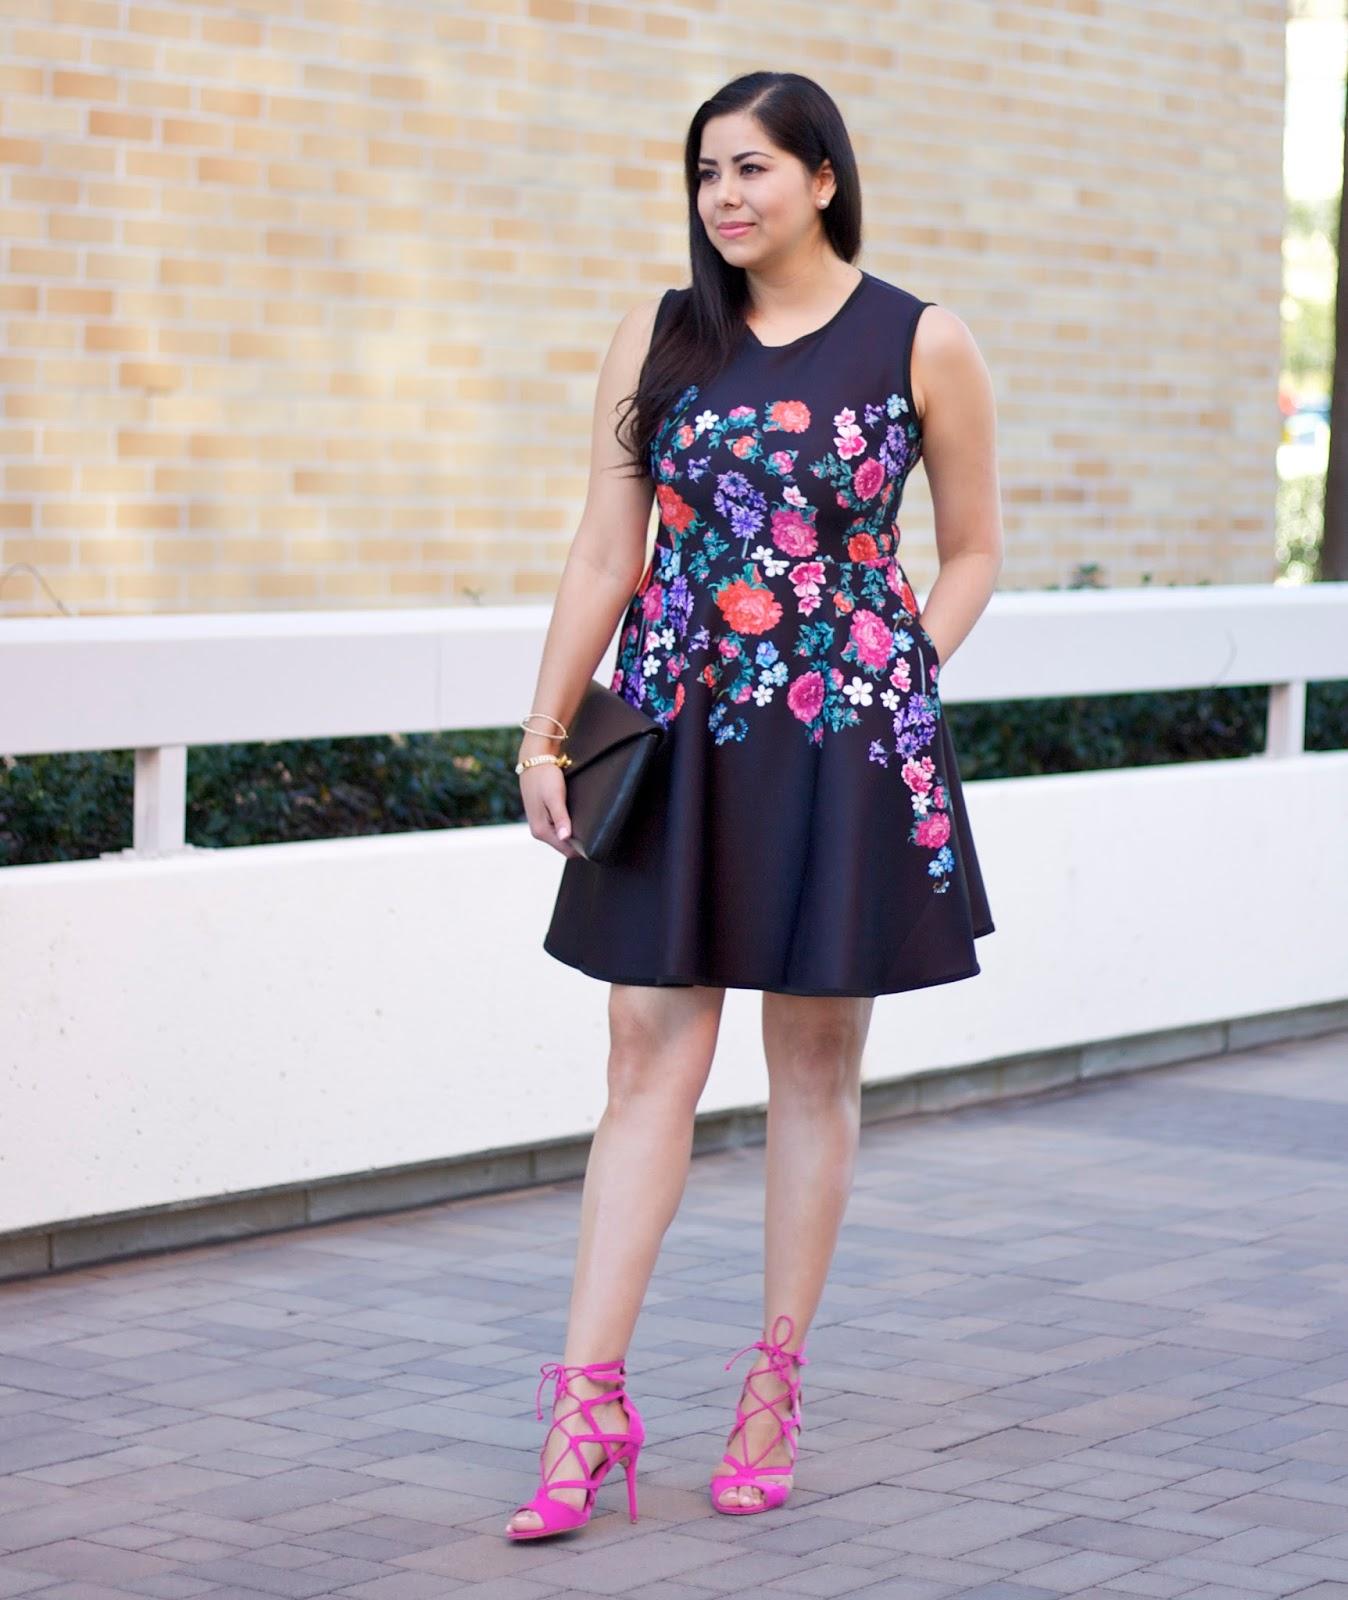 49d6c8f869e chicwish floral dress